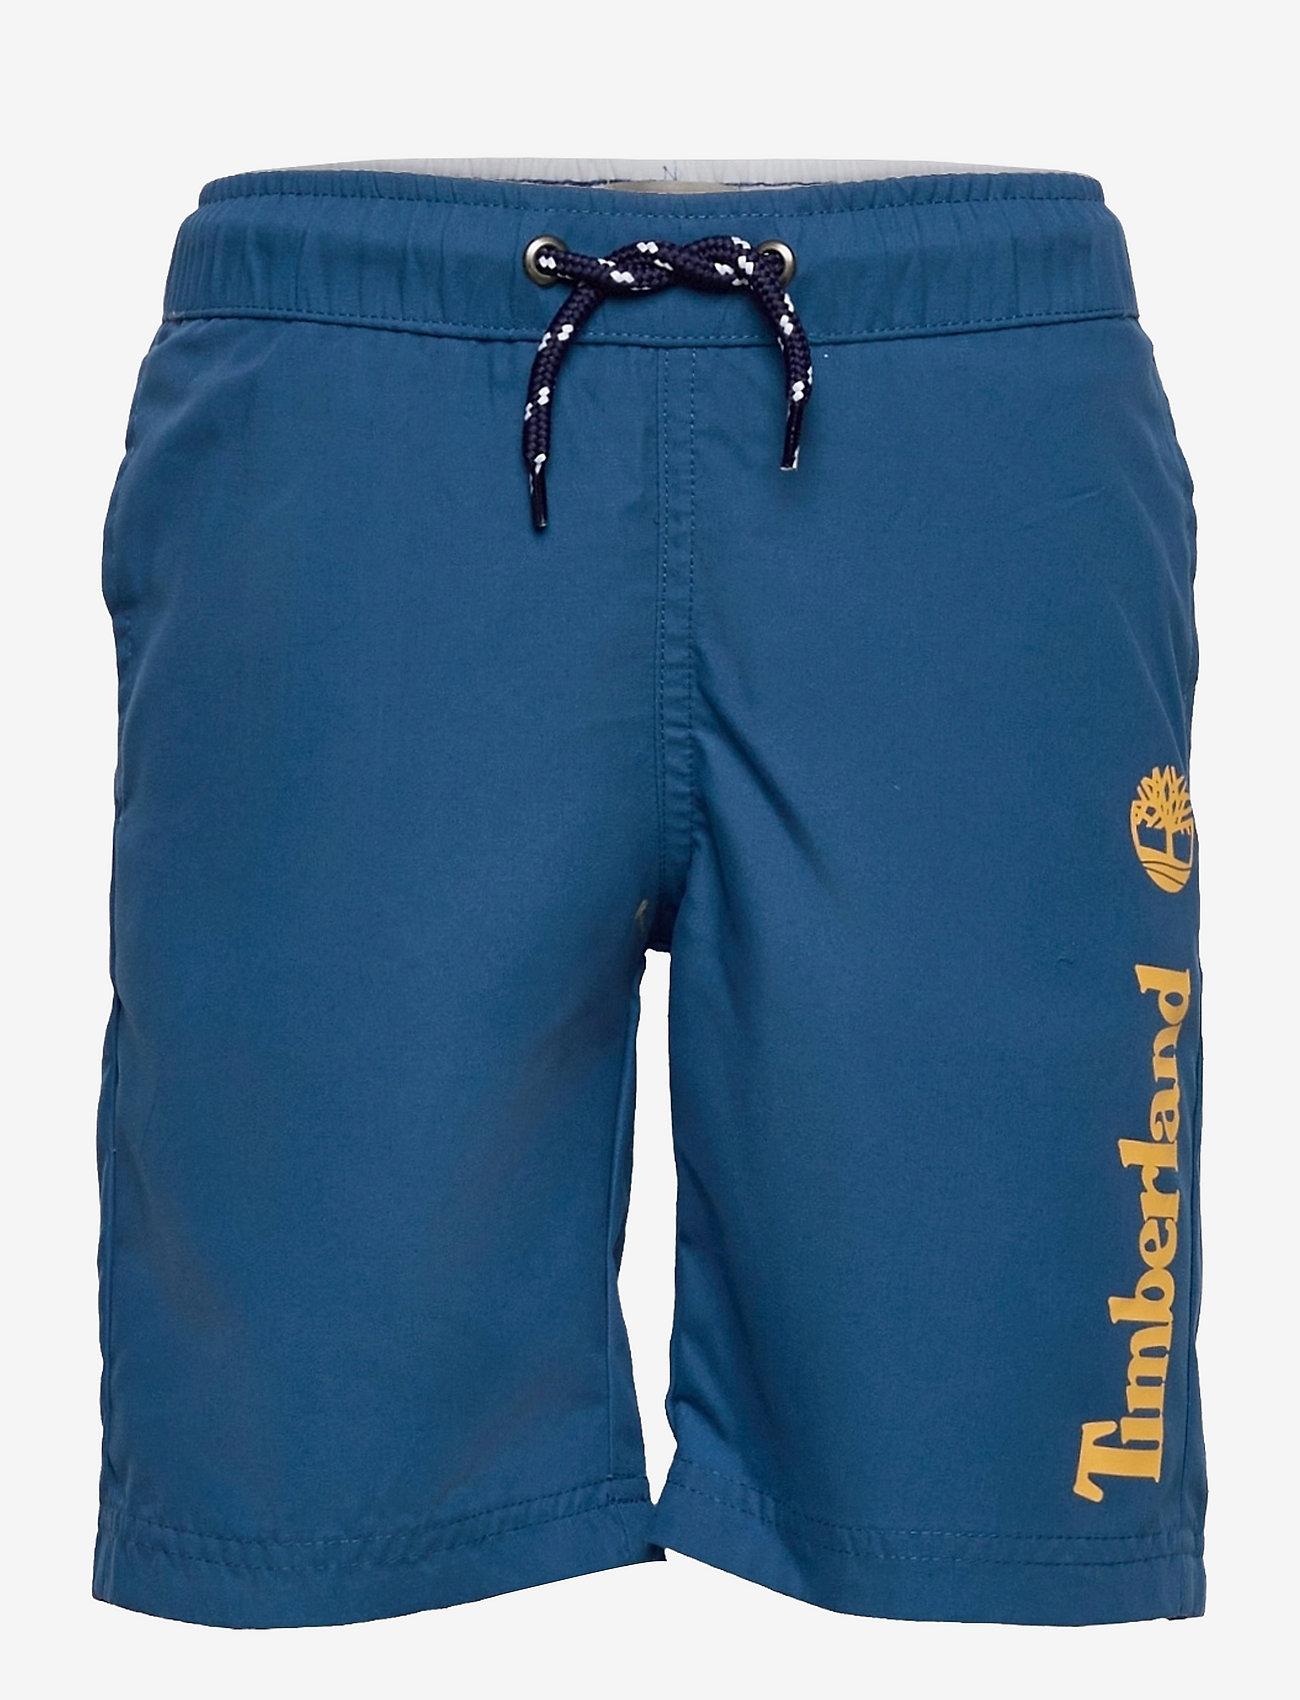 Timberland - SWIM SHORTS - badehosen - blue - 0